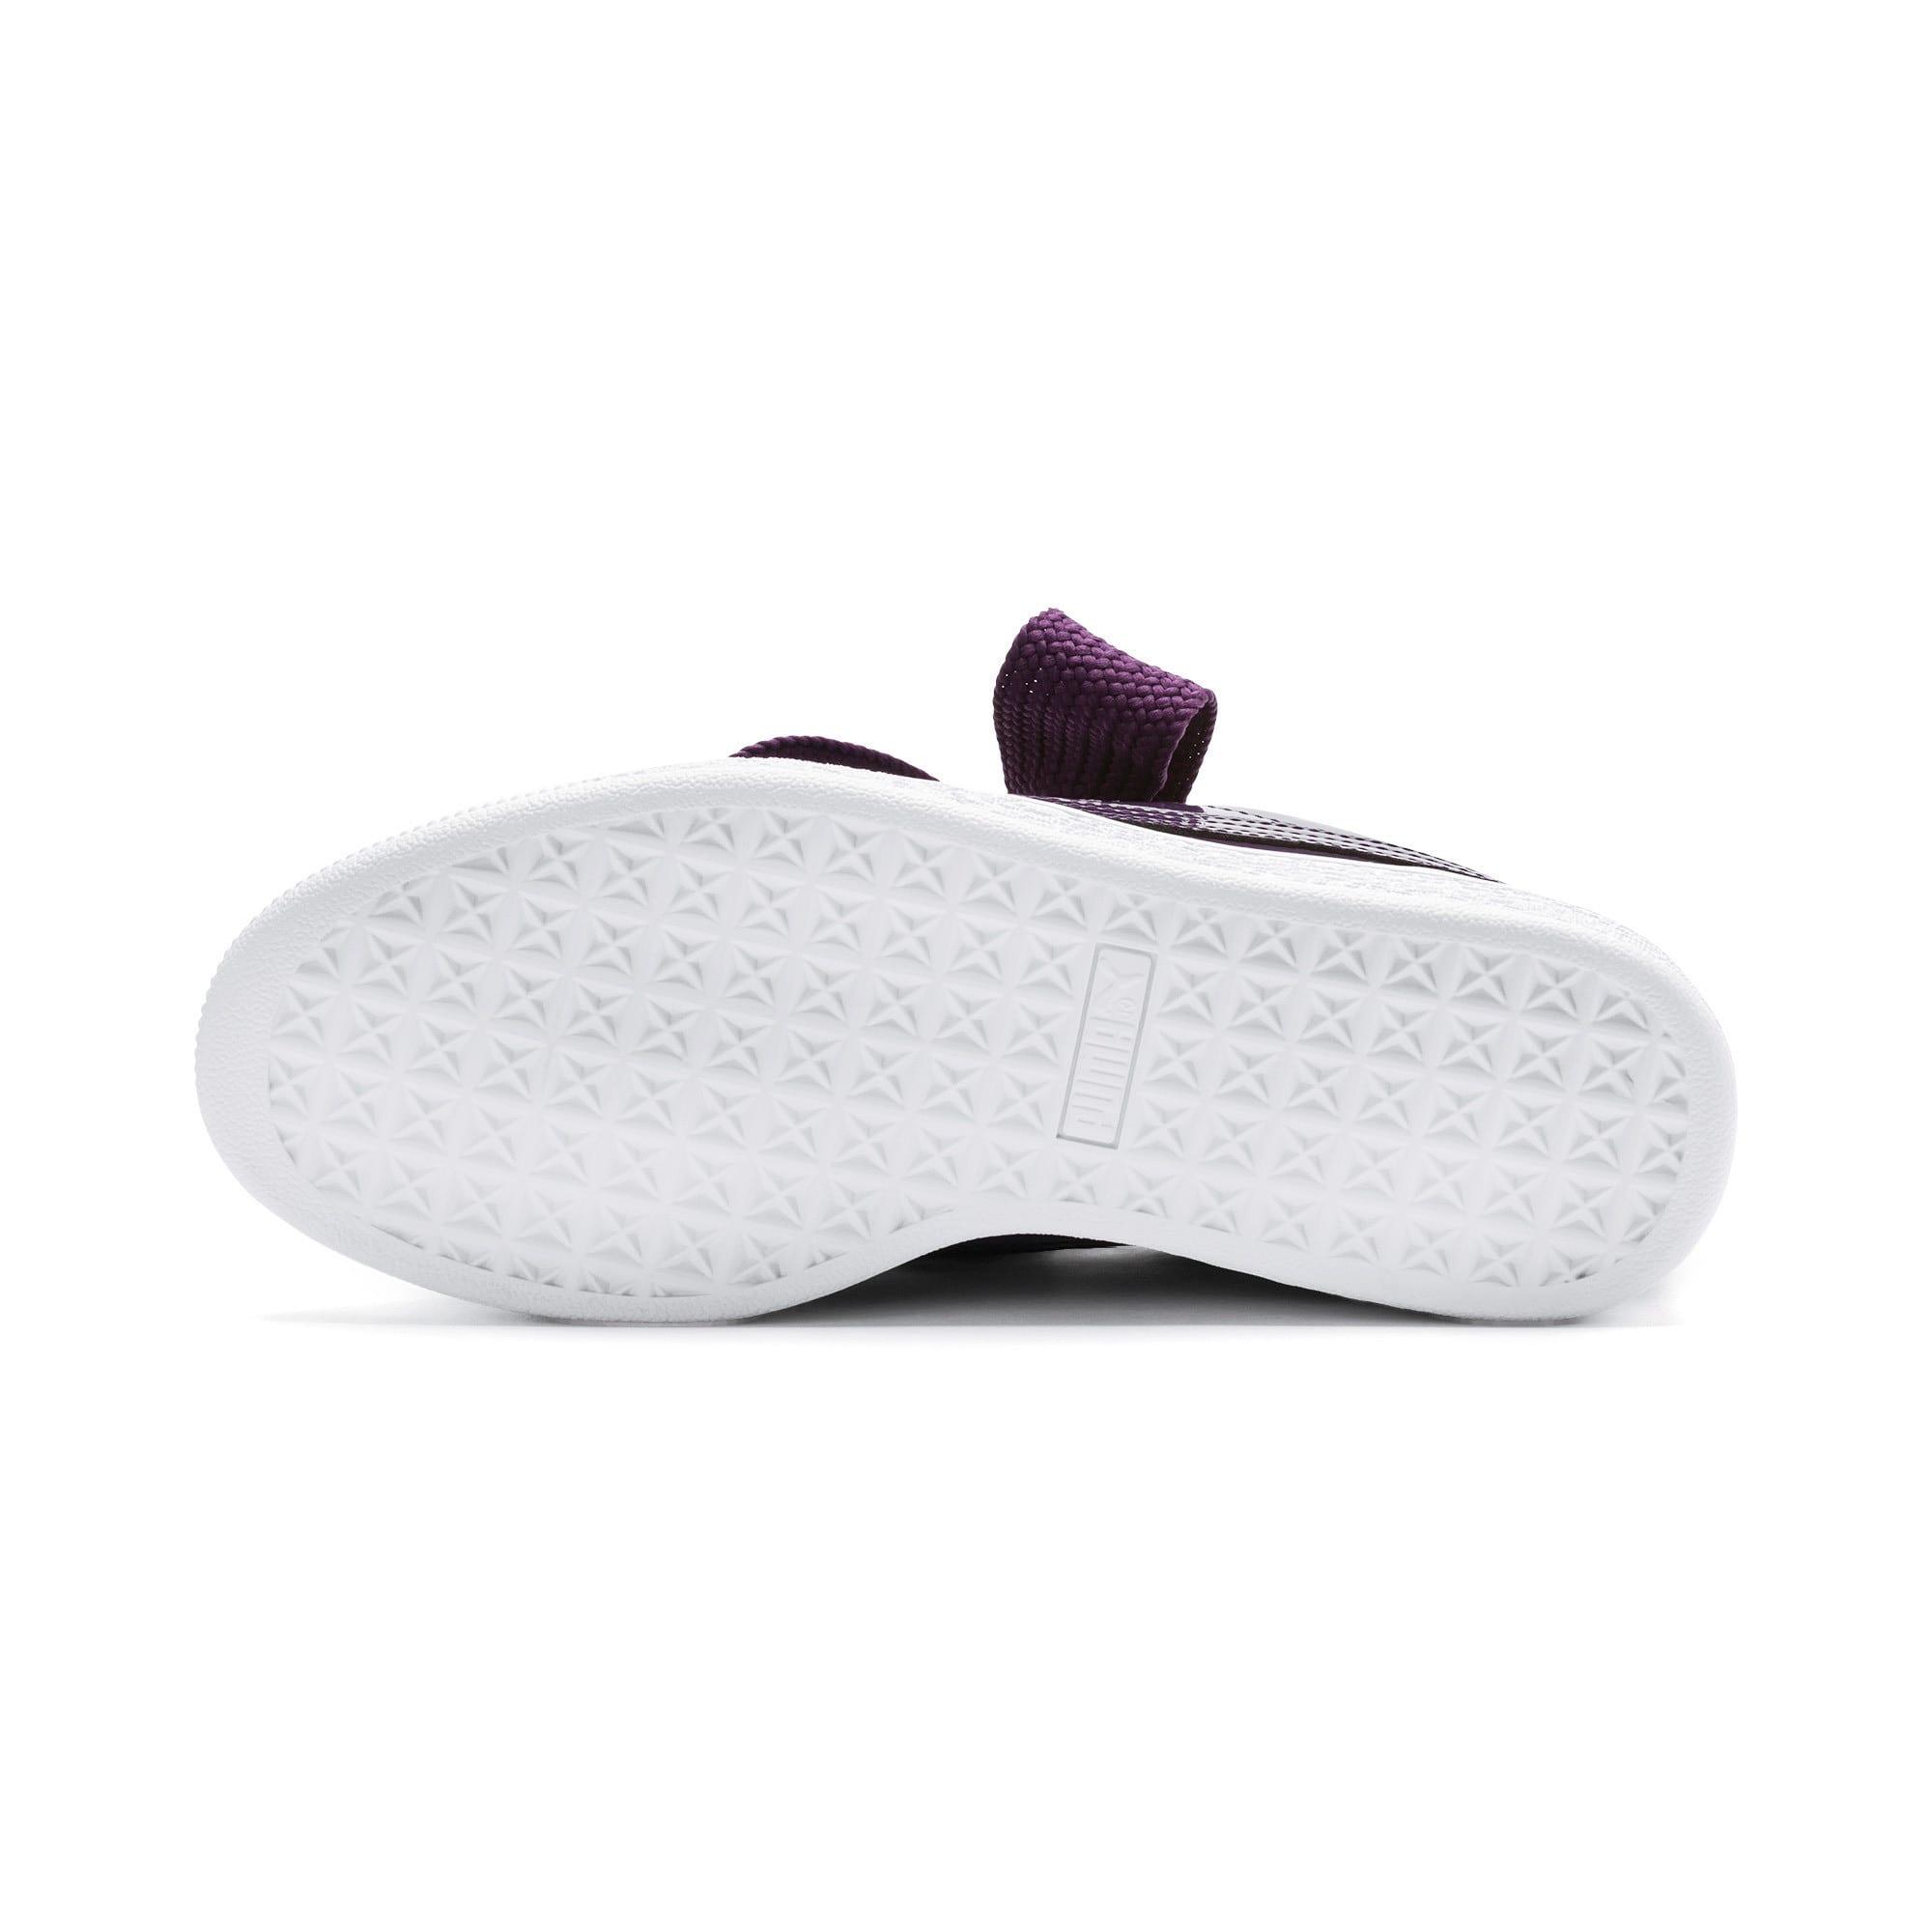 Thumbnail 3 of Basket Heart Patent Women's Sneakers, Indigo-Puma White, medium